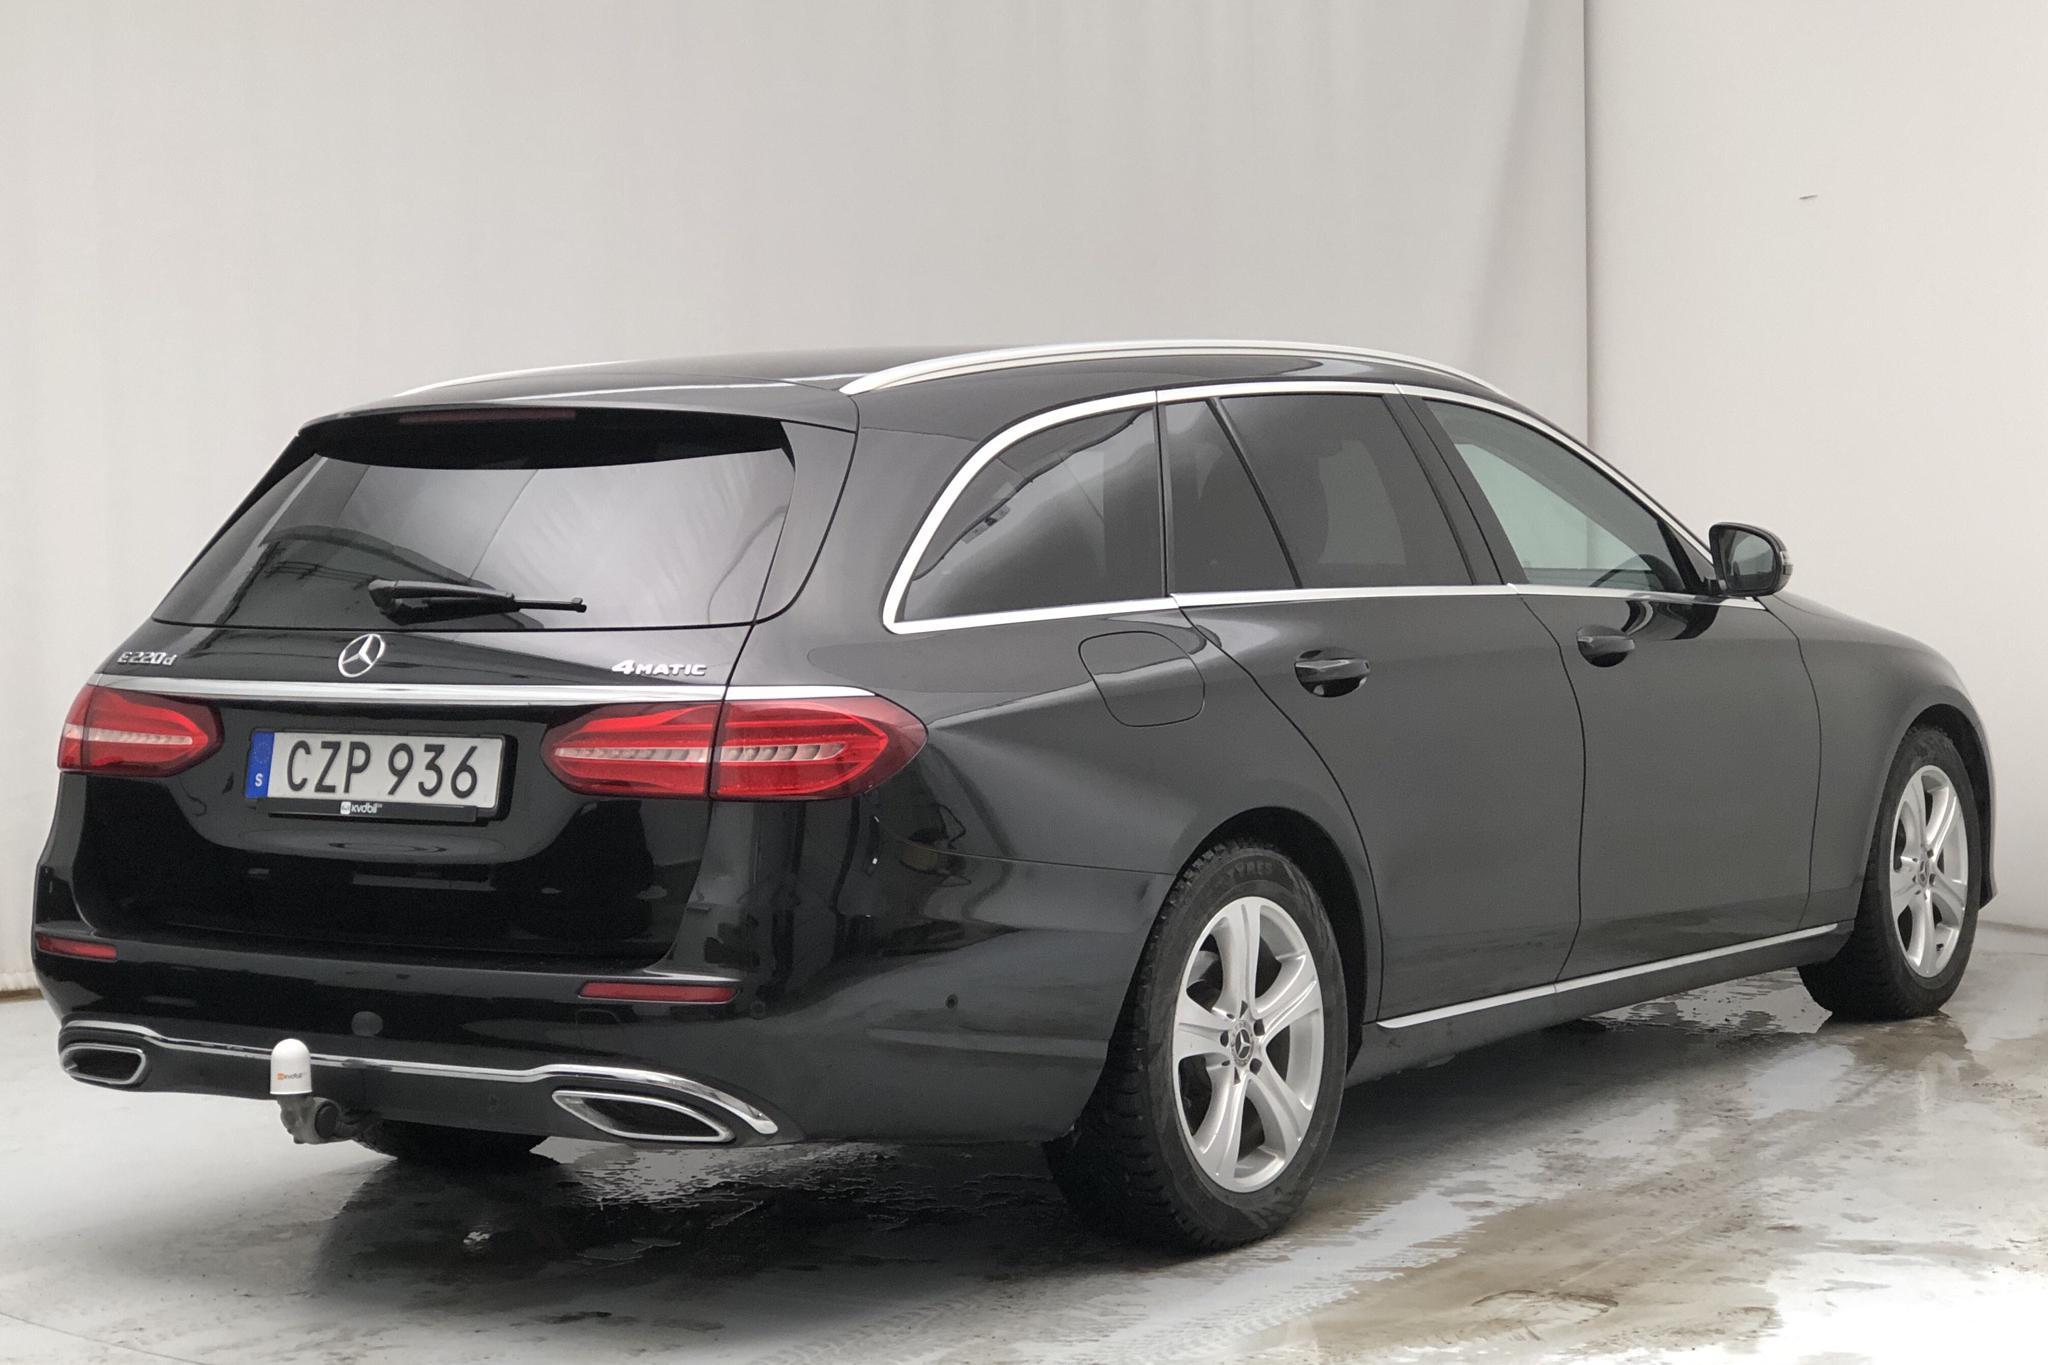 Mercedes E 220 d 4MATIC Kombi S213 (194hk) - 13 866 mil - Automat - svart - 2017